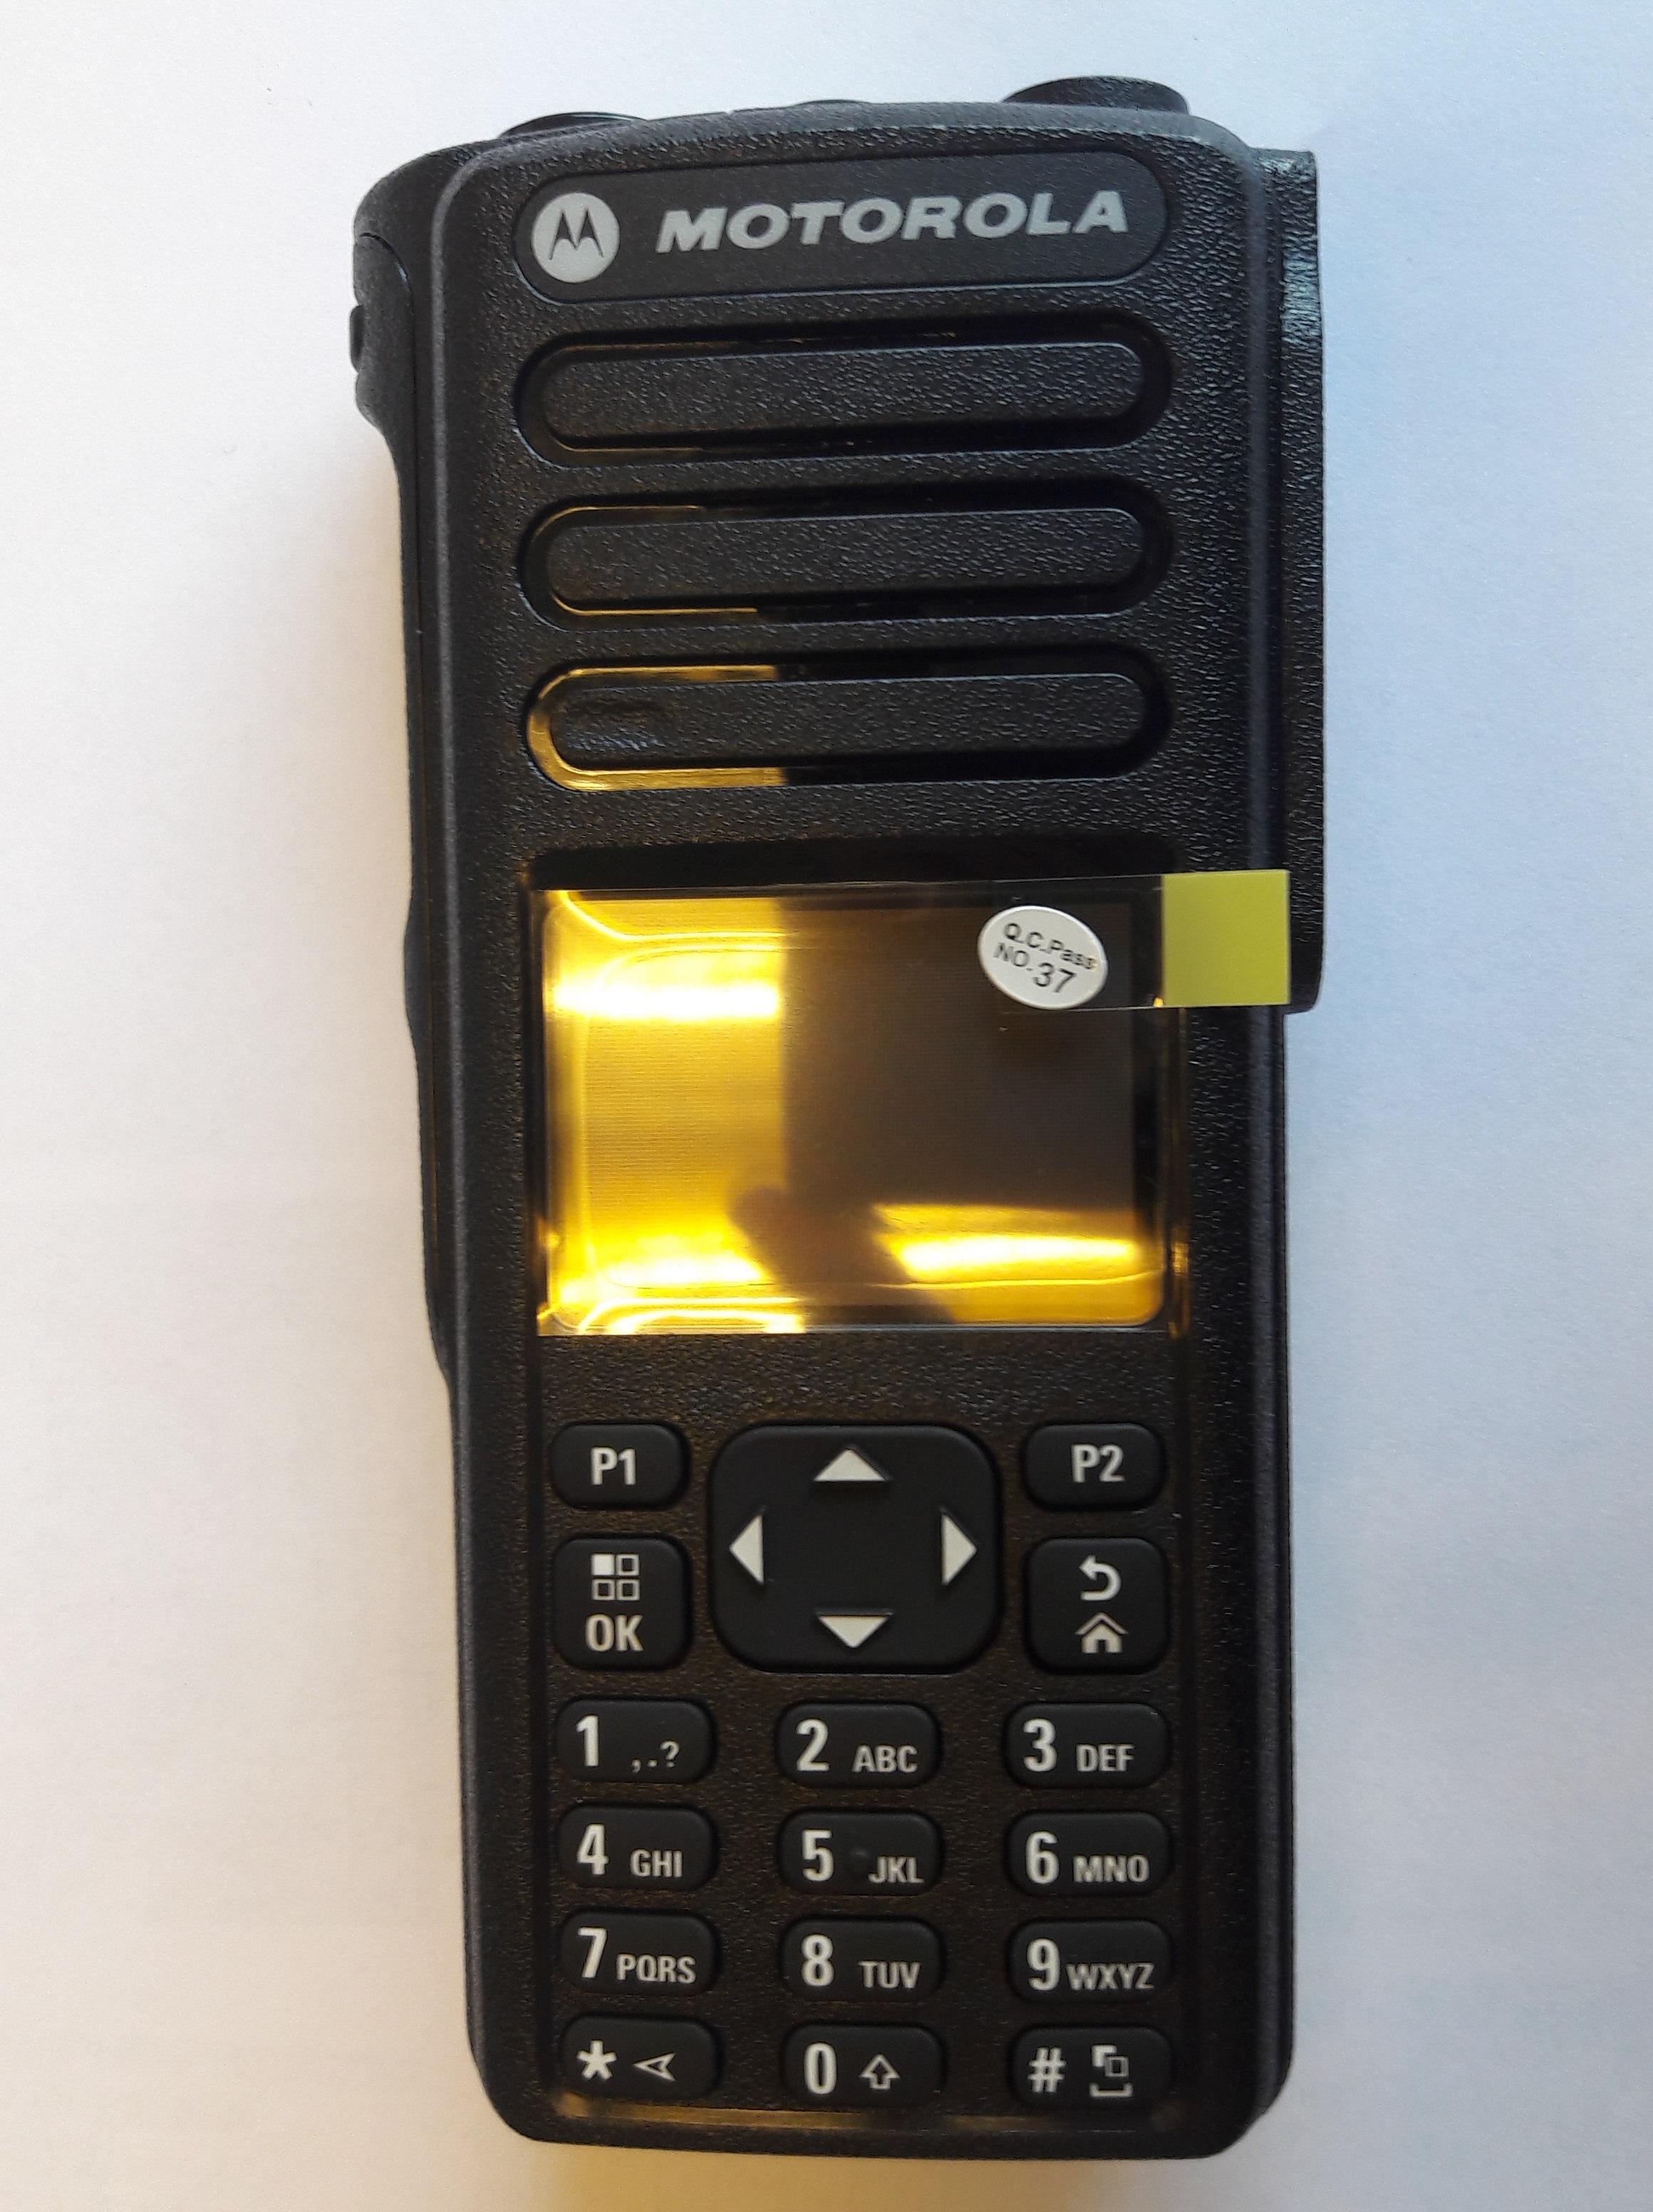 BNC Antenna Adapter for Motorola Radio for HLN9756 HT750 HT1250 HT1550 GP300 GP340 GP360 GP380